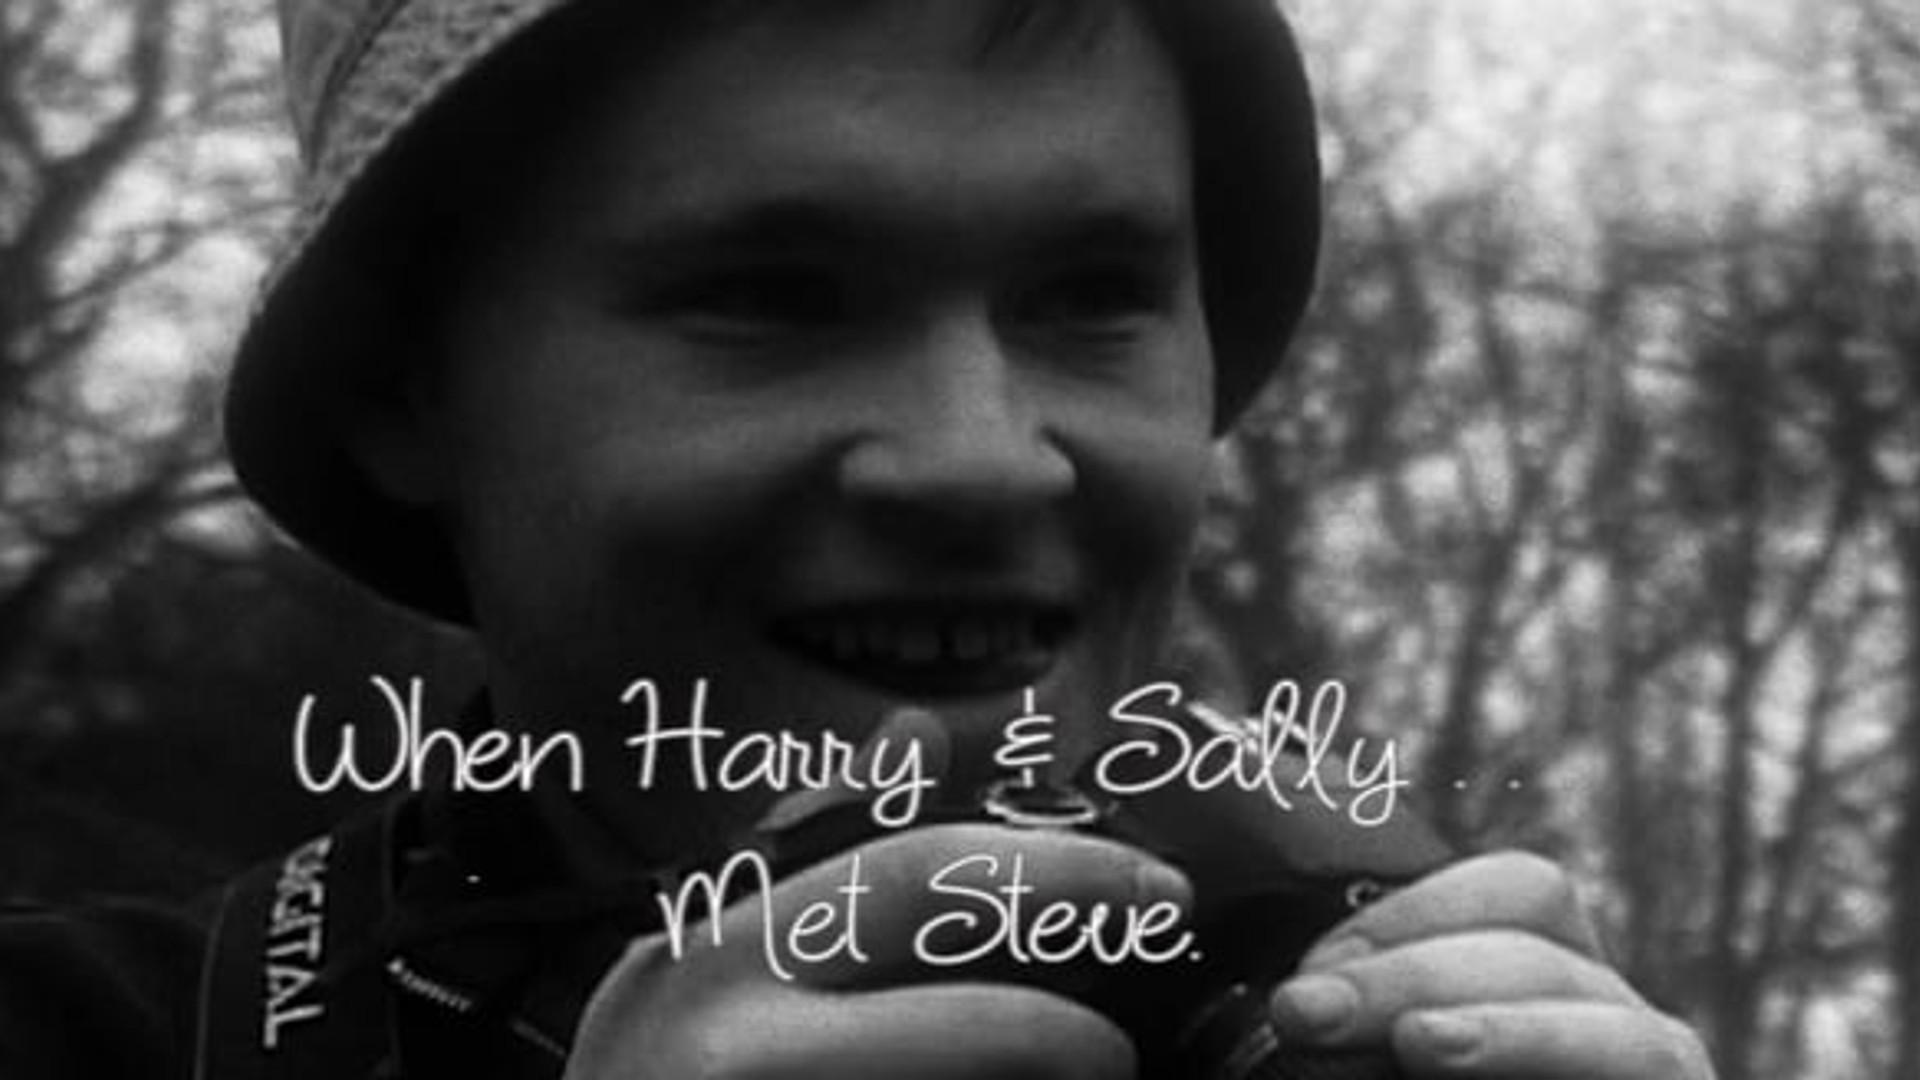 When Harry & Sally Met Steve